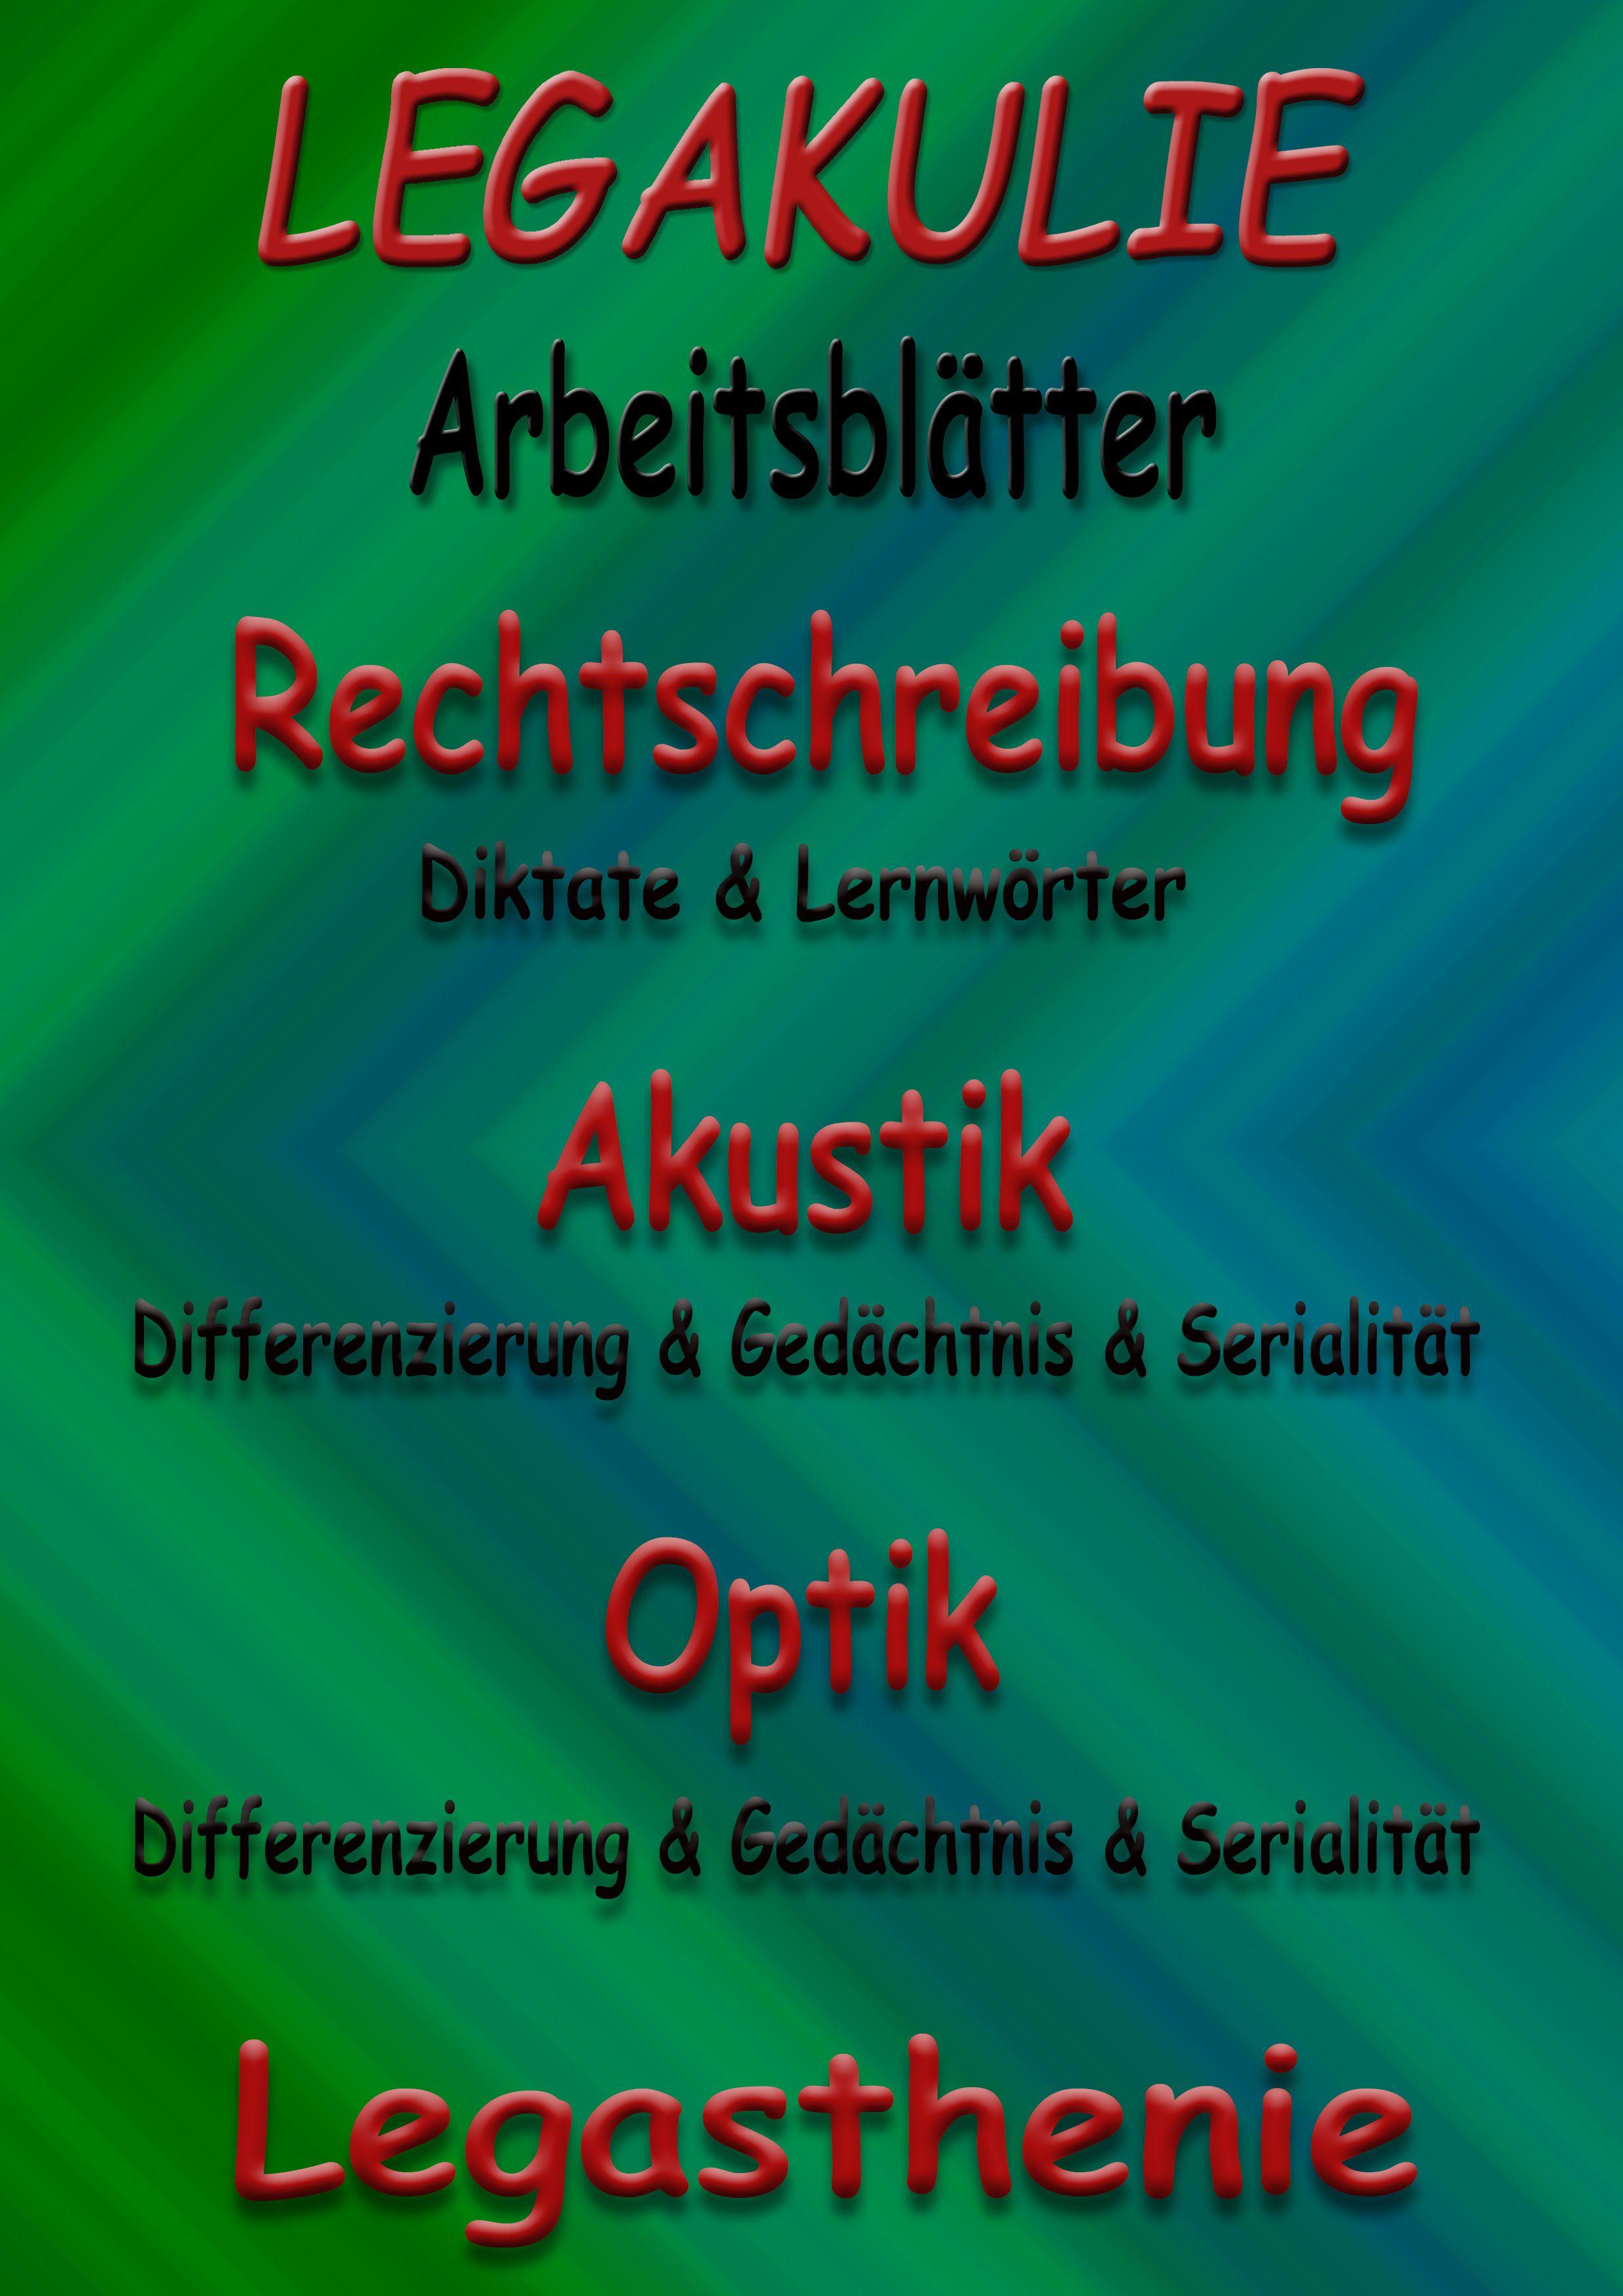 Legasthenie #Arbeitsblatt #PDF #Legasthenieunterricht Arbeitsblätter ...